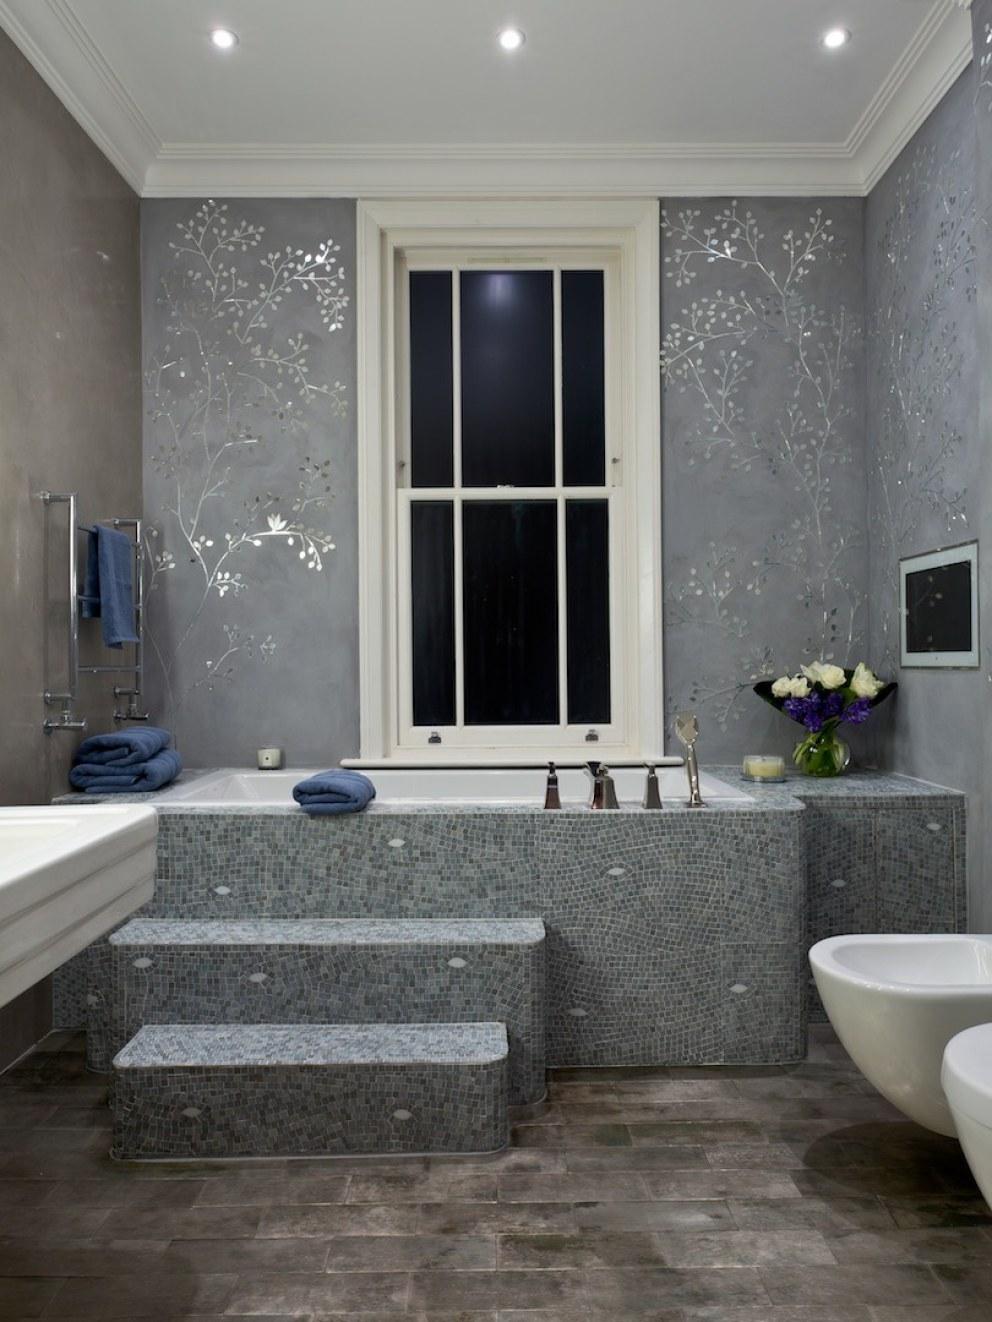 Master Bedroom Bathroom Dressing Room Kensington Master Bath